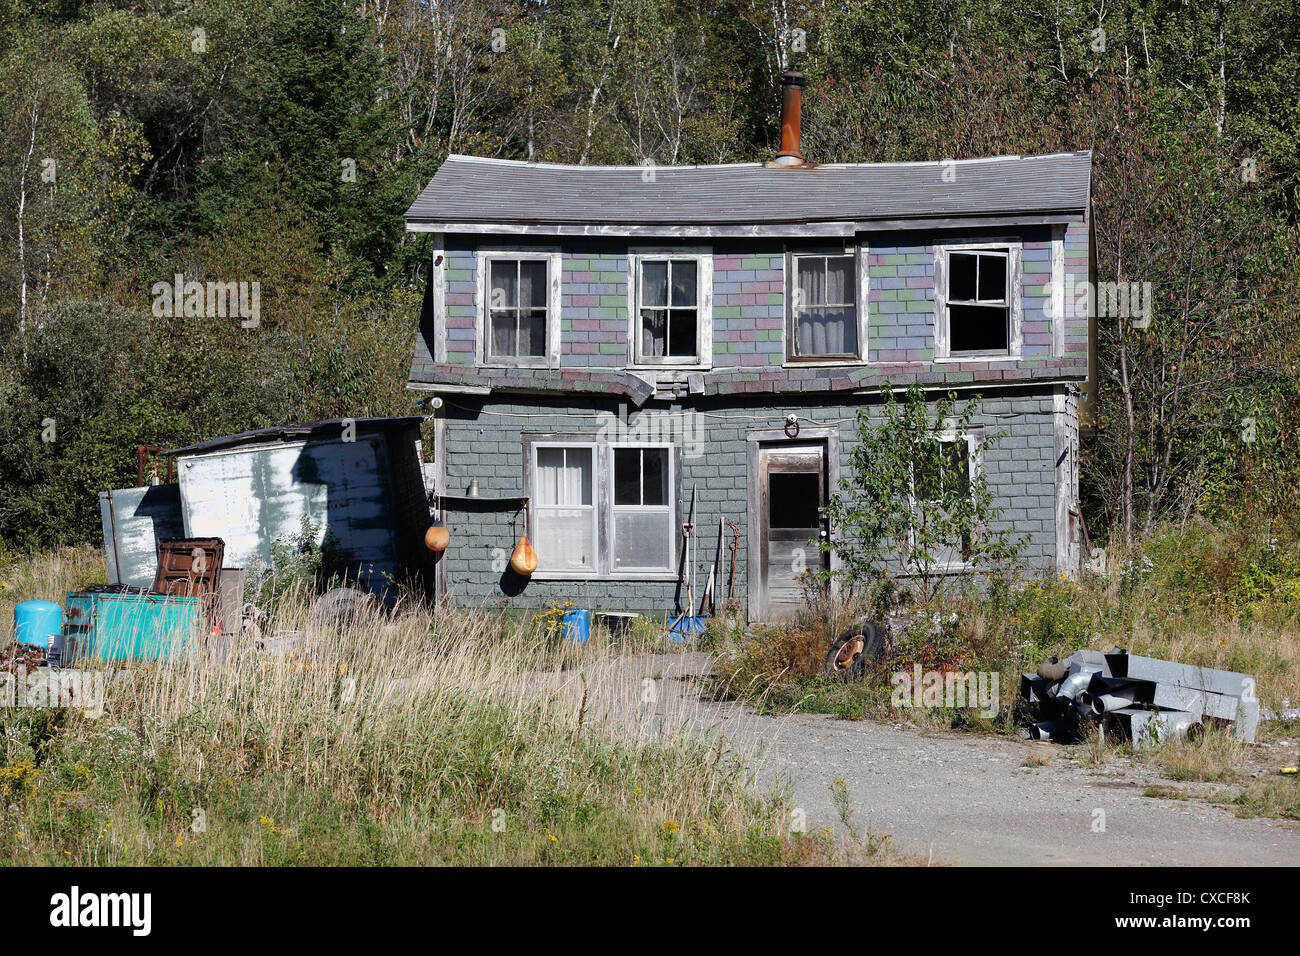 house in disrepair, New Brunswick, Canada - Stock Image